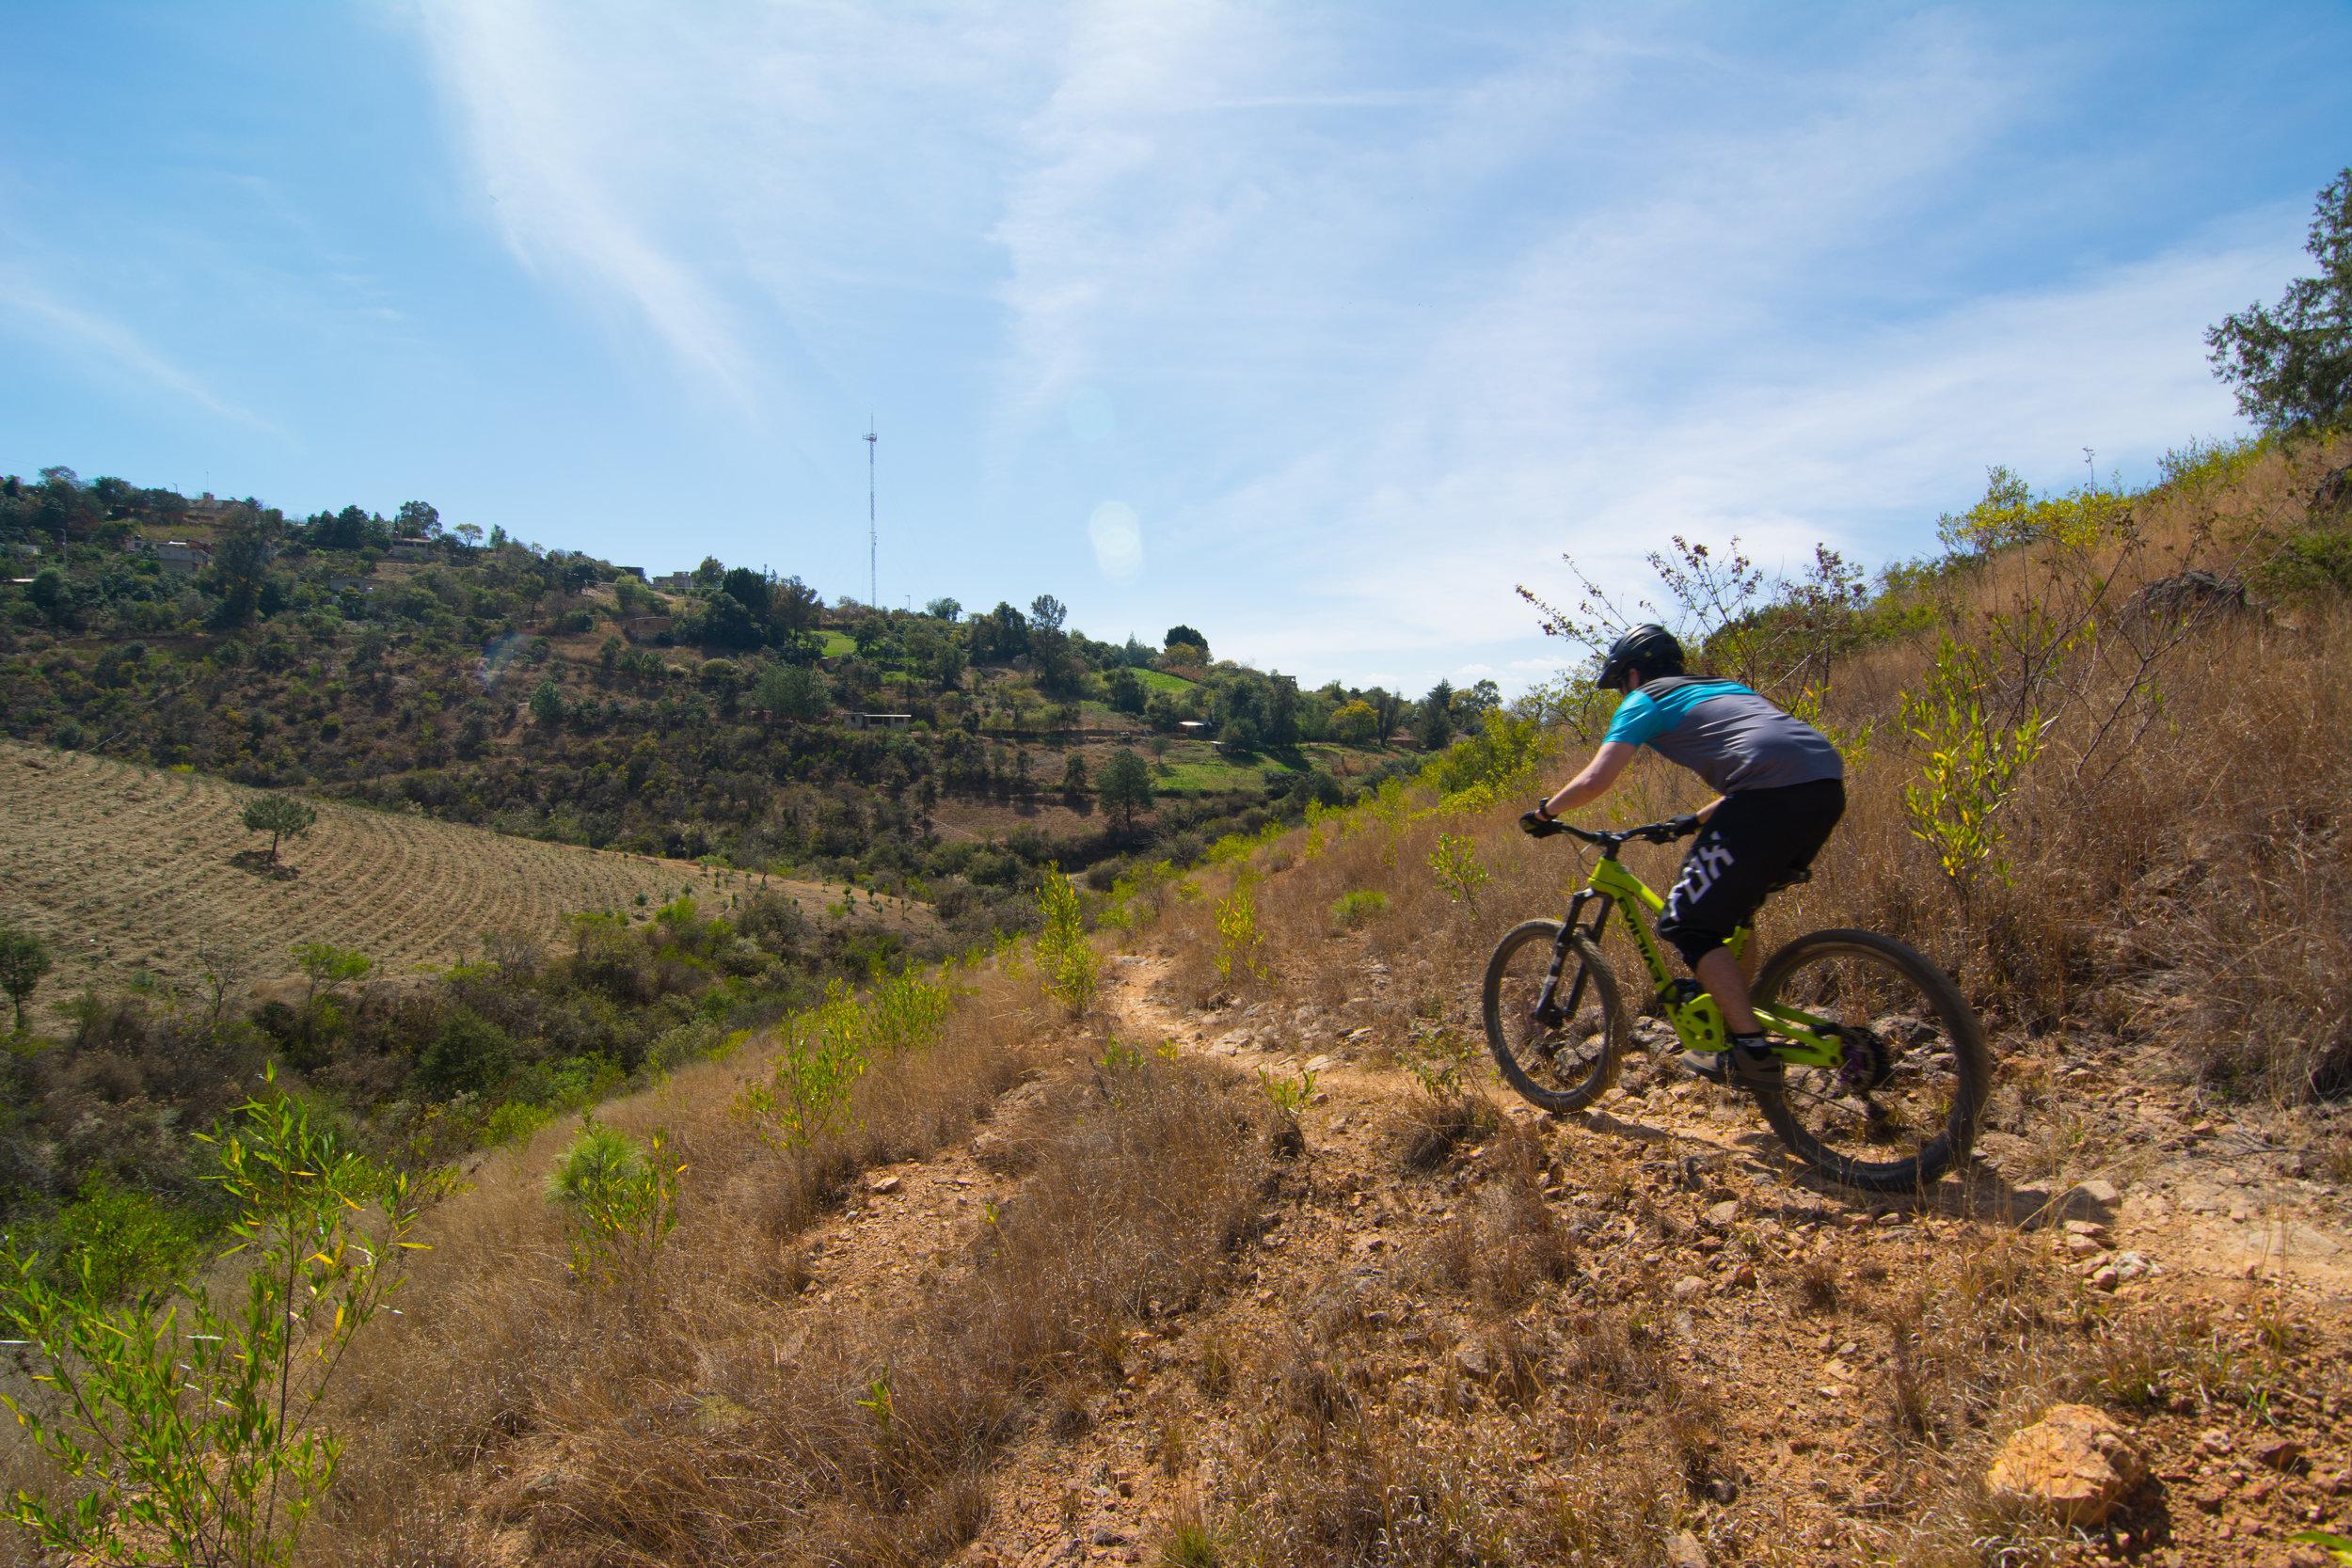 Etla, Mexico mountain bike enduro trails with shuttled rides